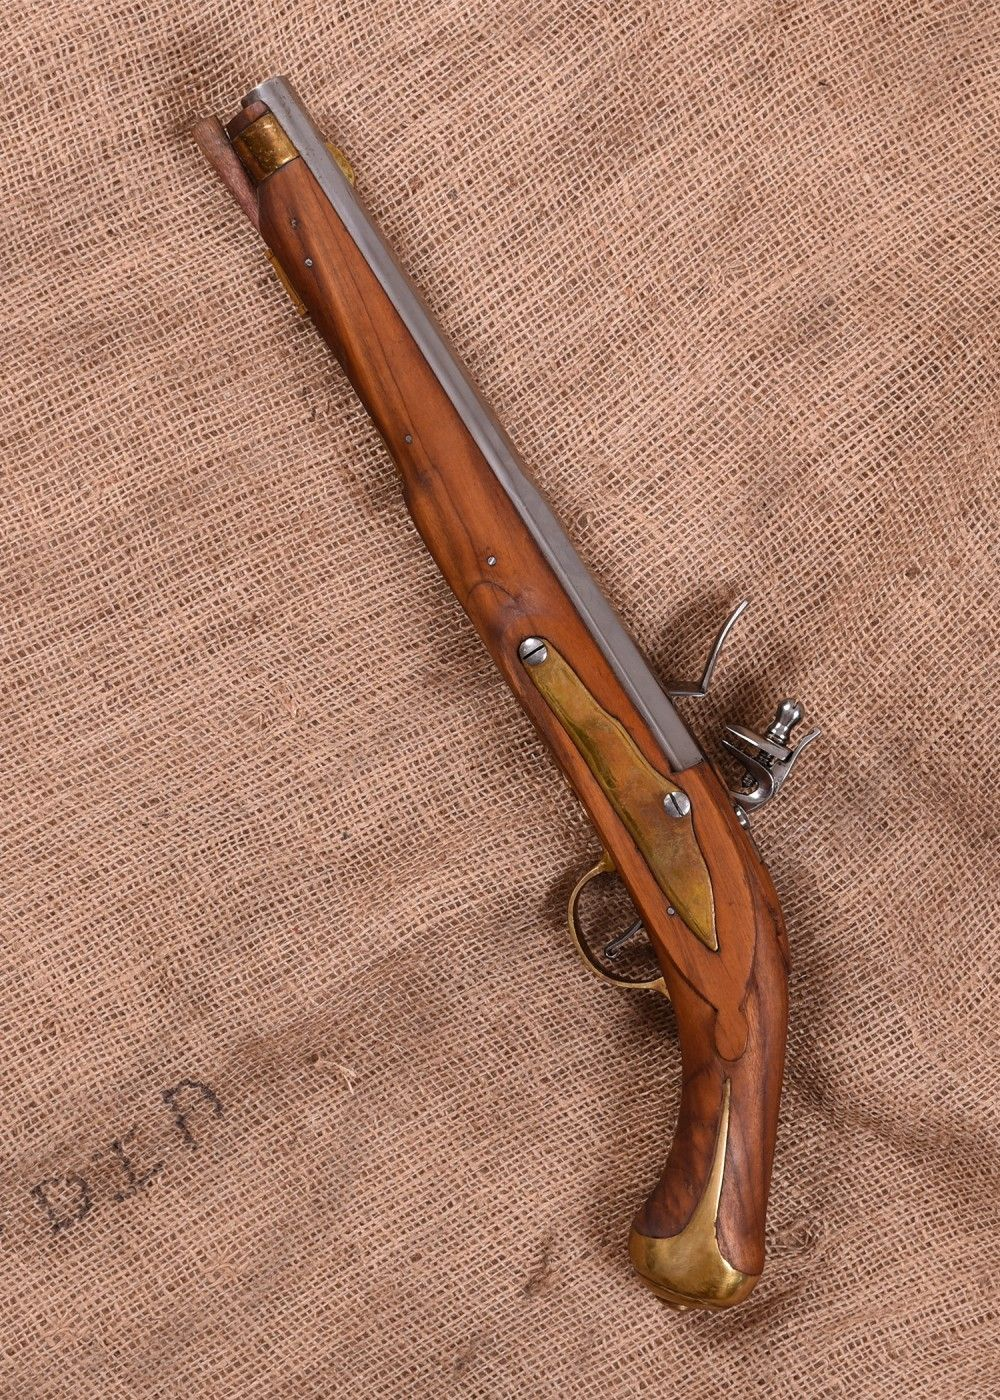 tienda_tercios_pistola_cierre_pedernal_siglo_XVII-XVIII_2